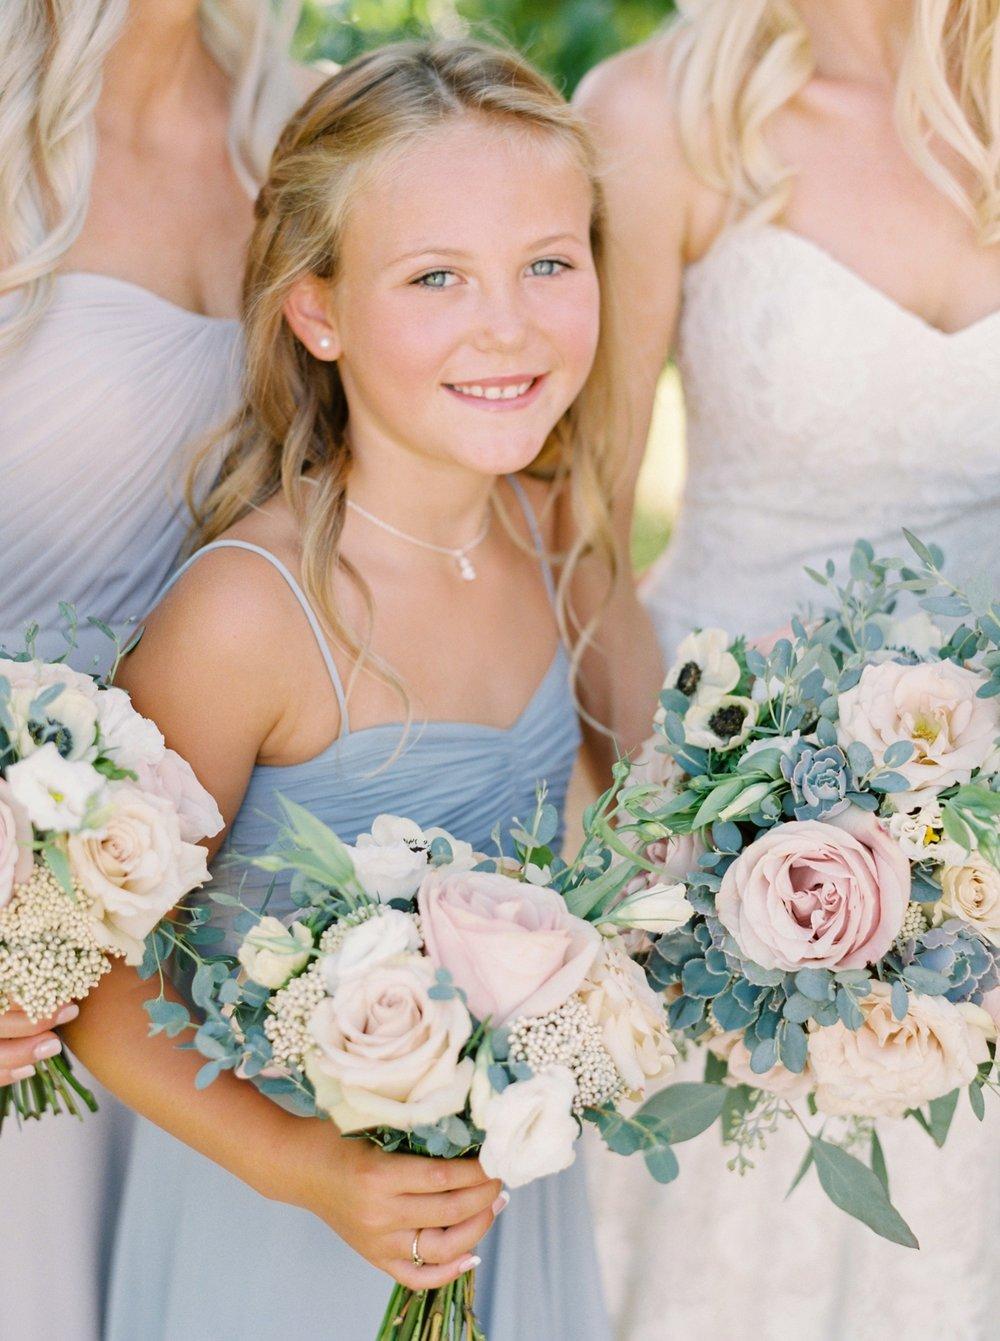 Kelowna wedding photographers | hotel eldorado wedding | okanagan wedding | Justine Milton fine art film Photography | pastel bridal bouquet | blush and blues | bouquet